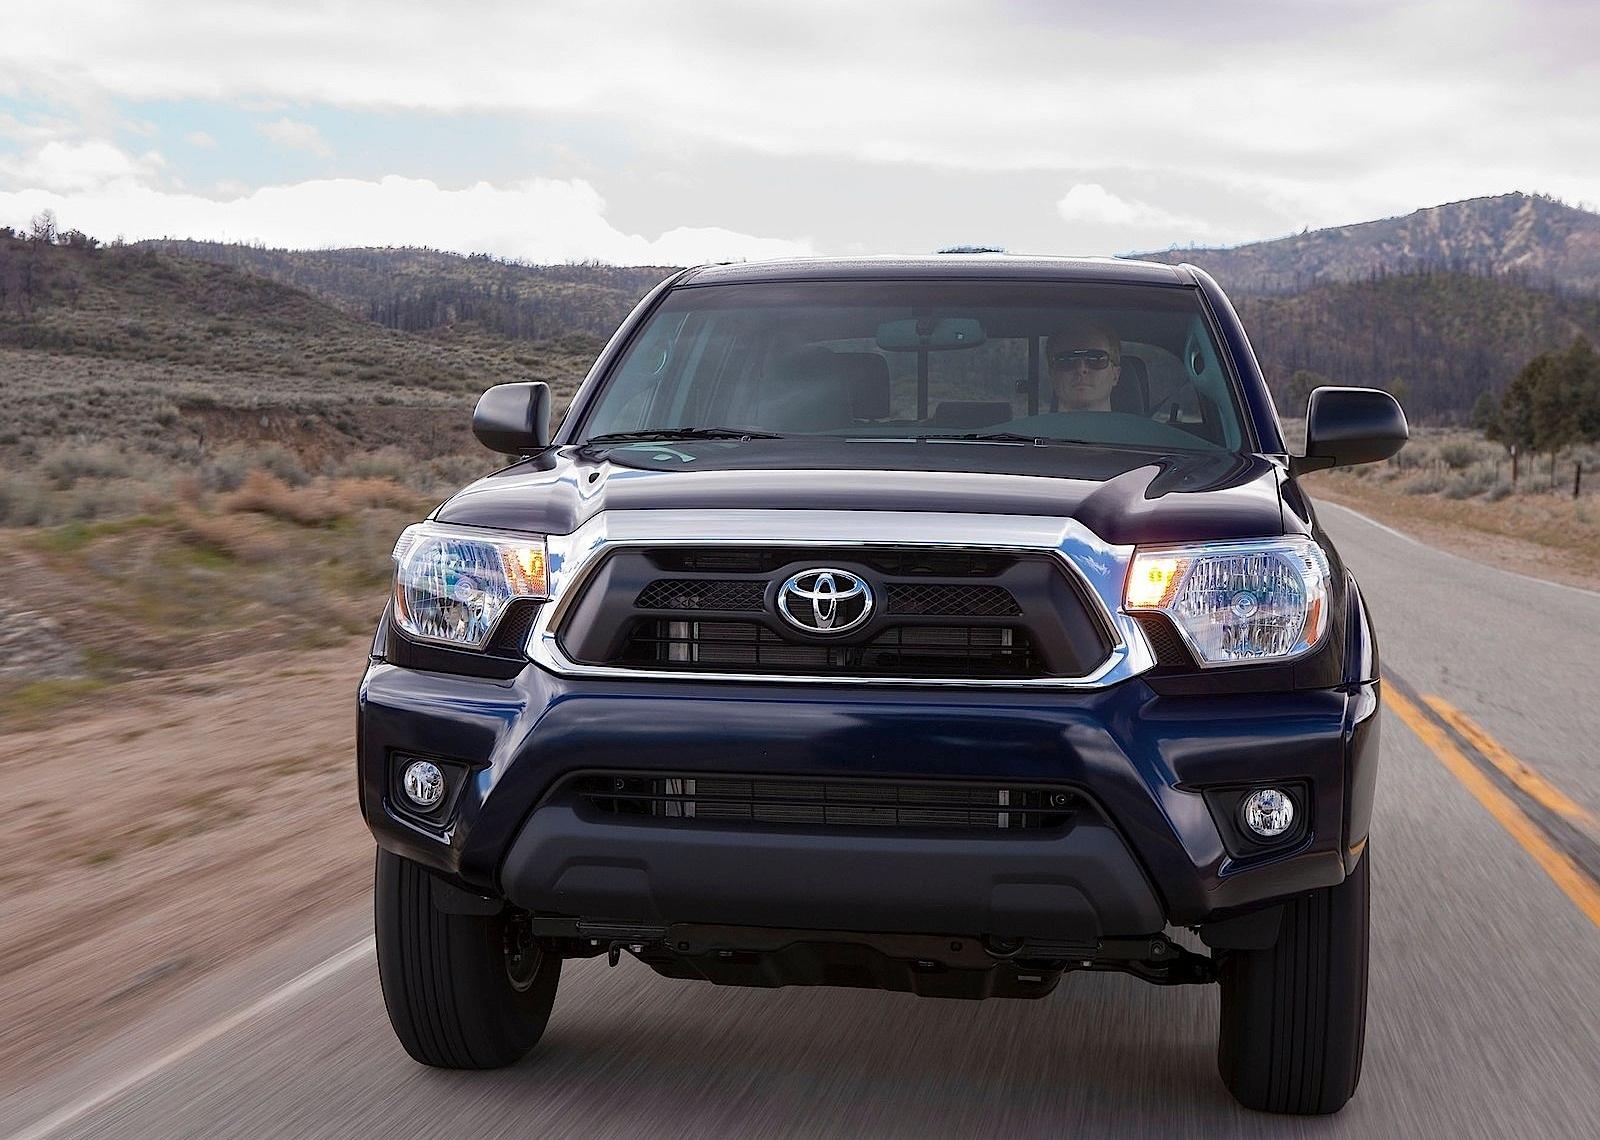 2015 Toyota Supra Price >> TOYOTA Tacoma Double Cab specs & photos - 2011, 2012, 2013 ...